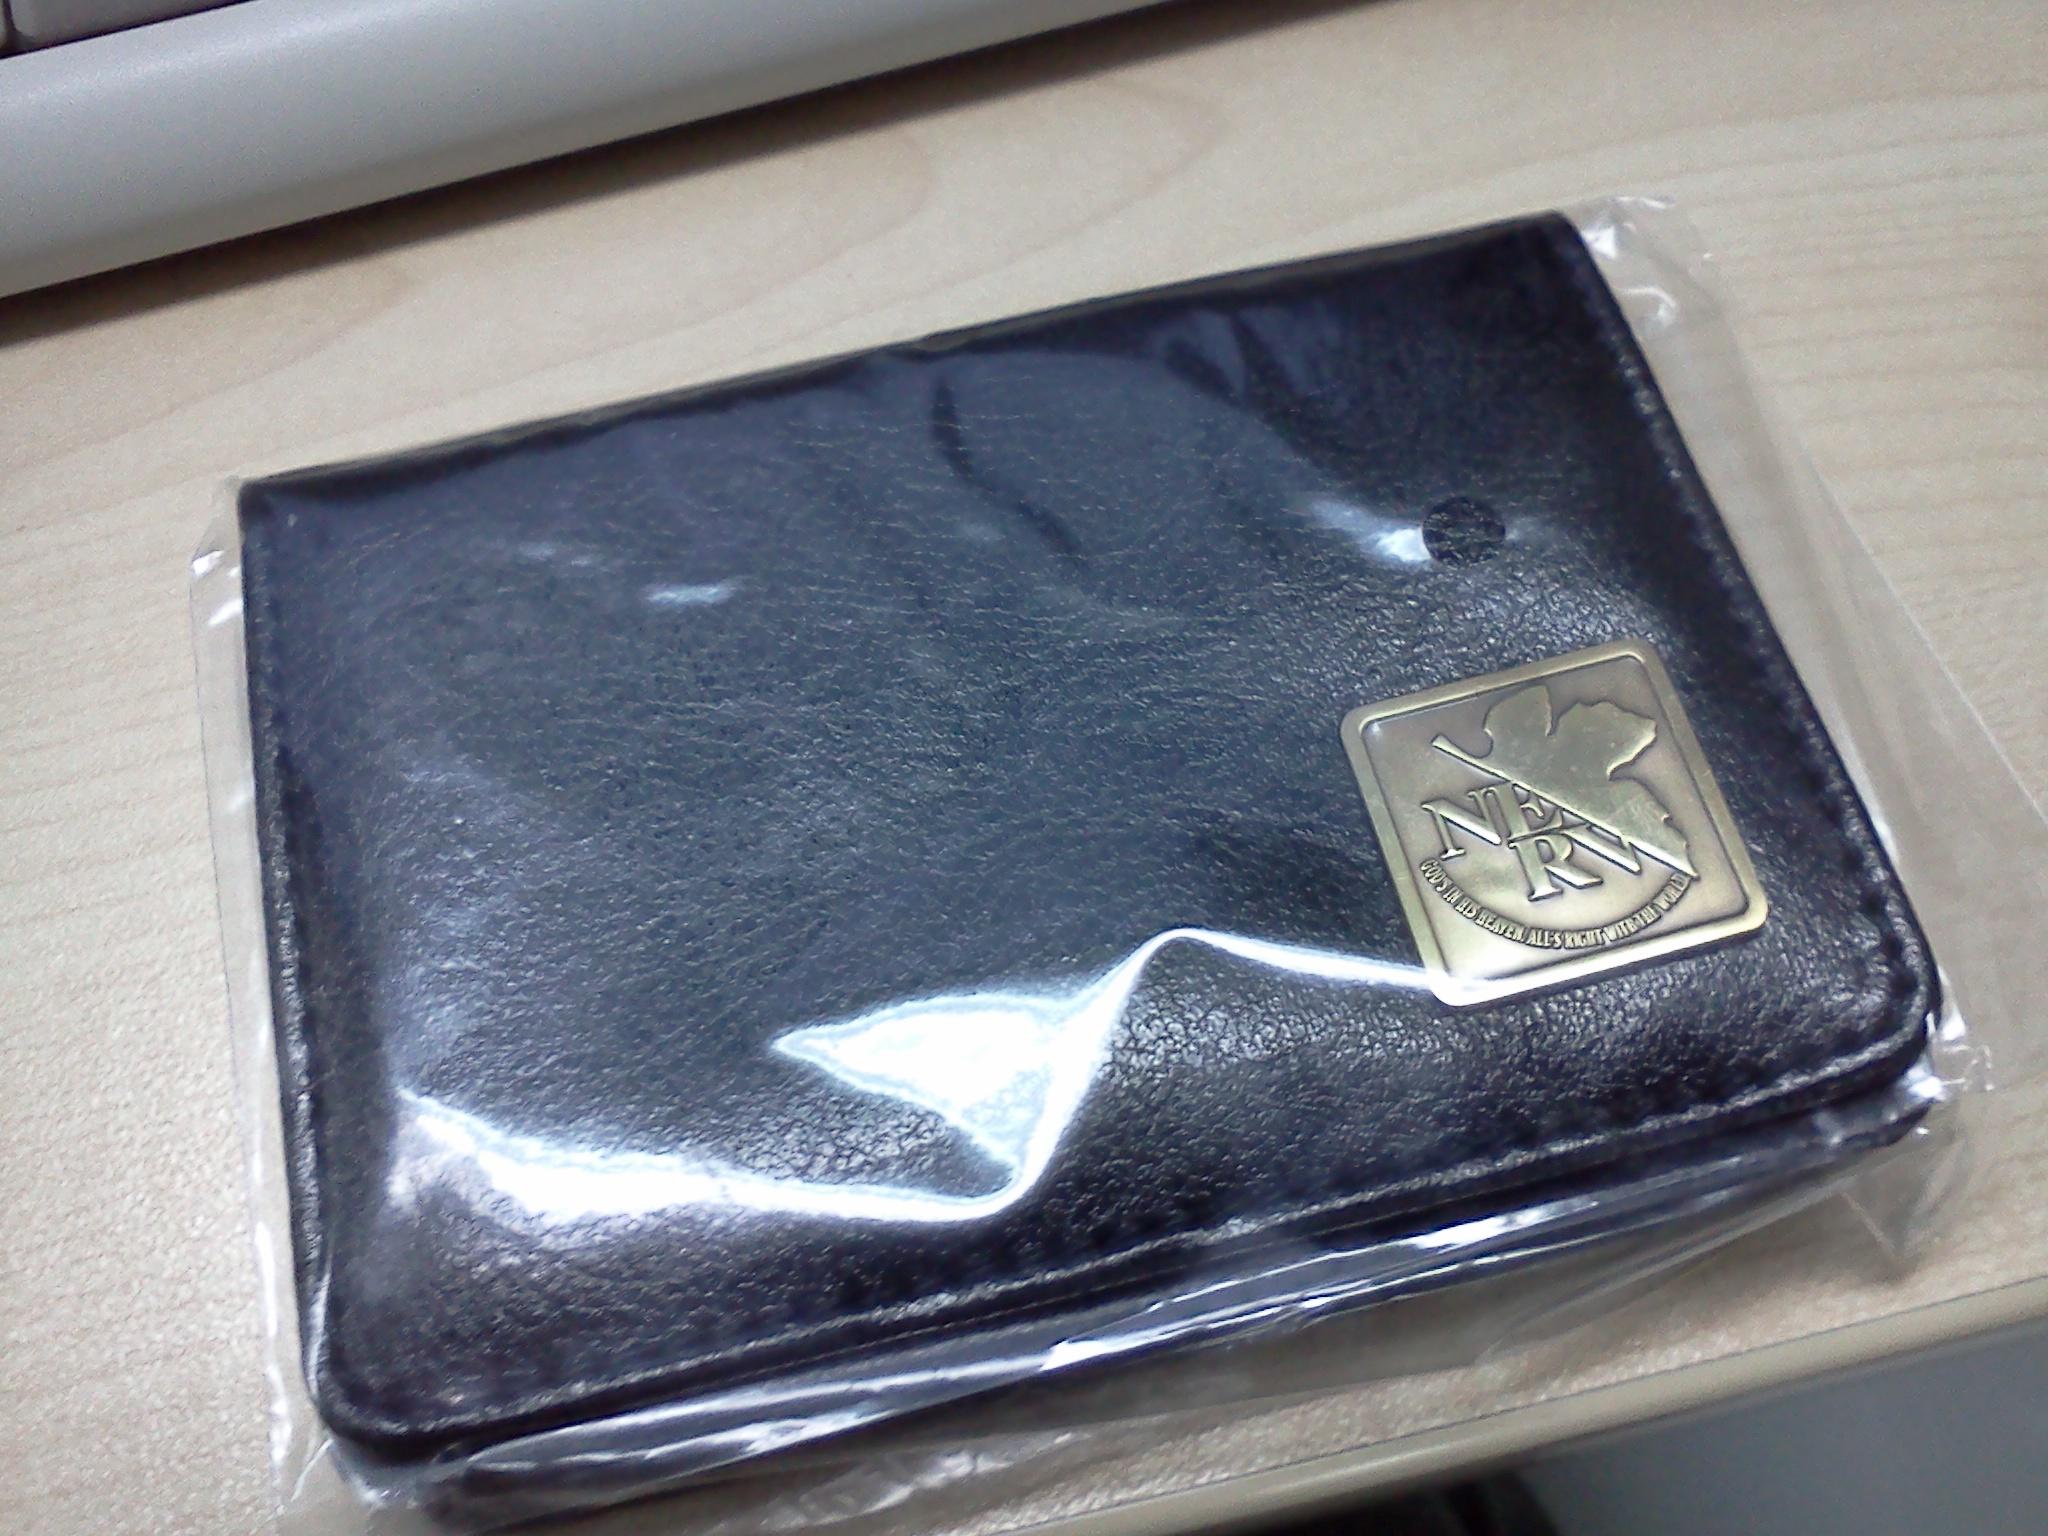 NERV Cardholder